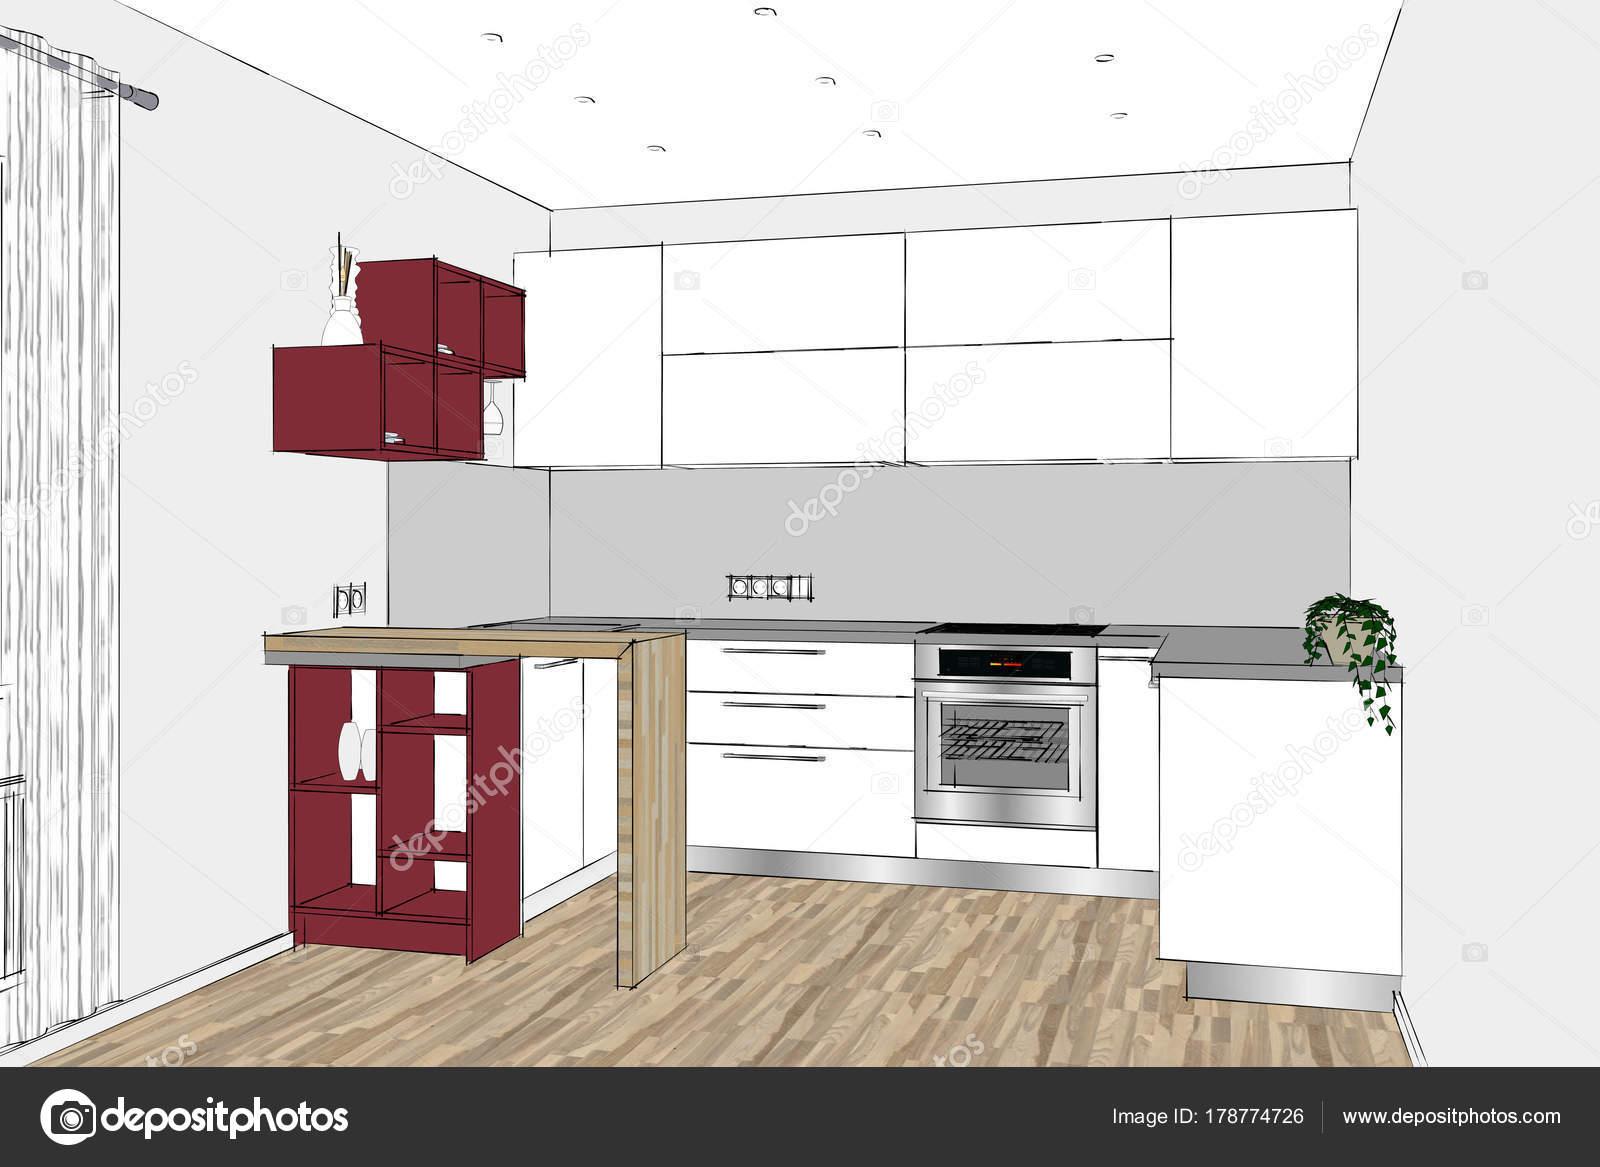 Rendering Moderne Küchendesign Hellen Innenraum Design Skizze Zimmer ...